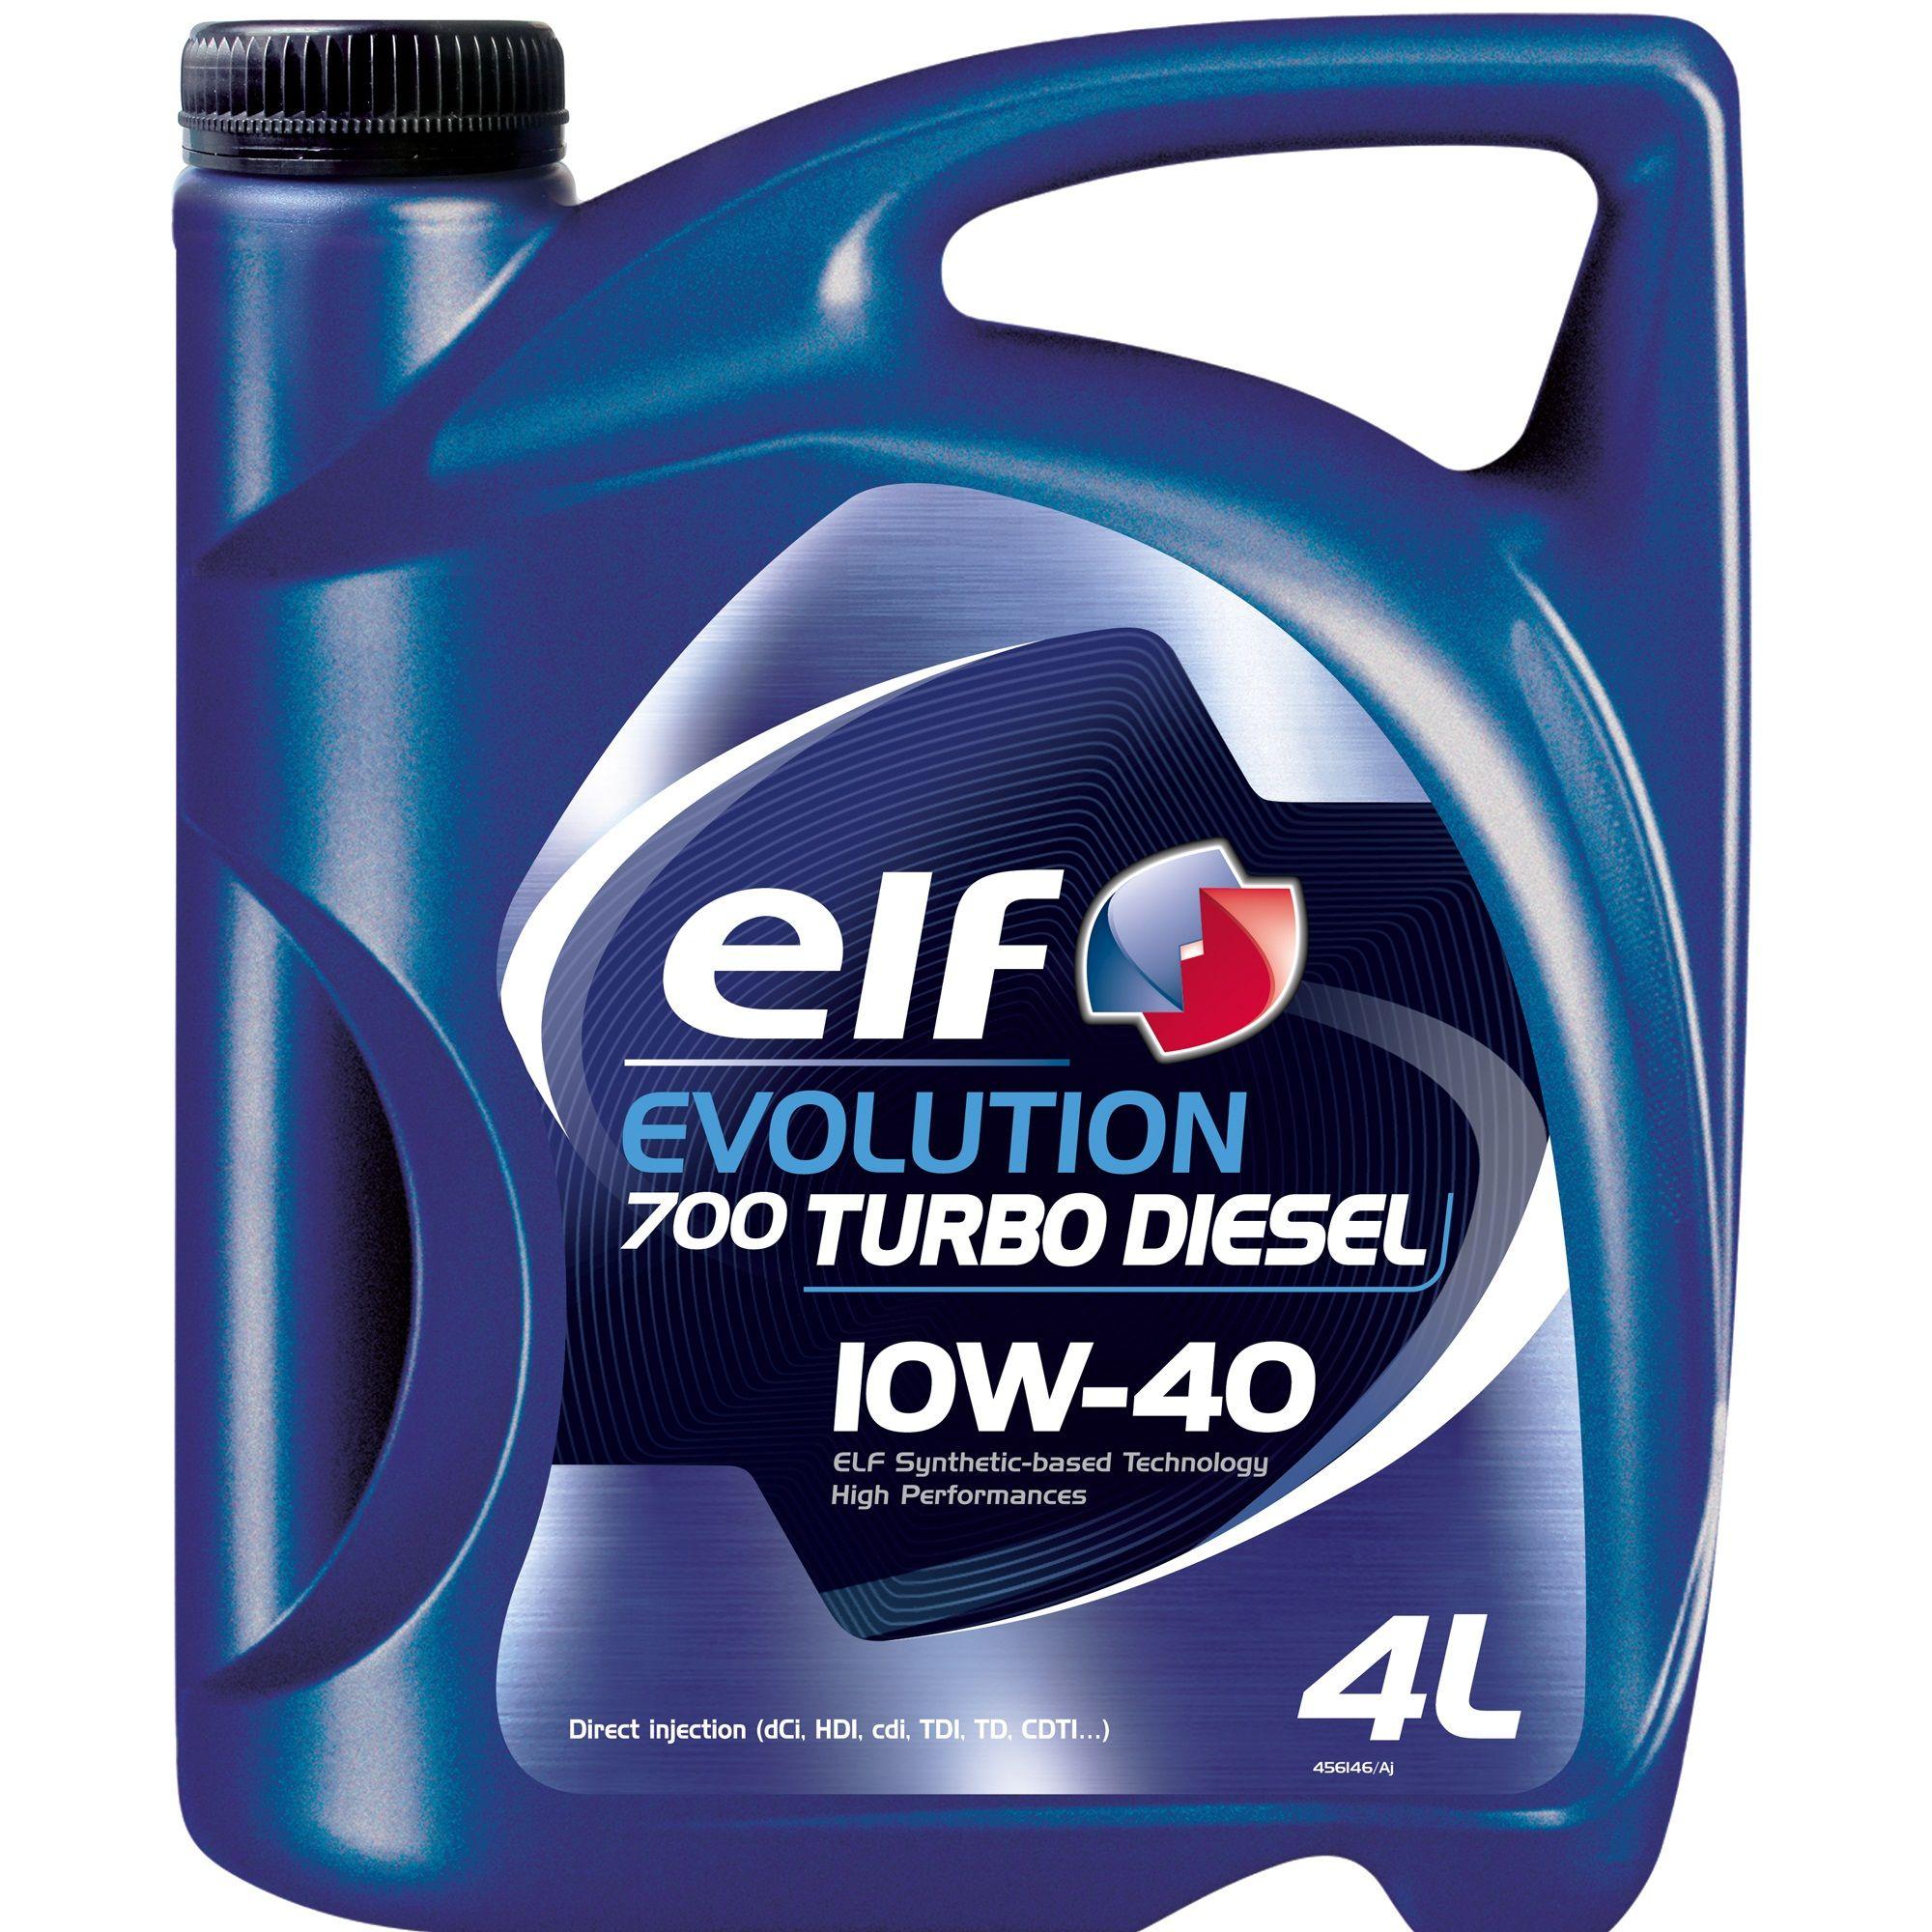 Ulei motor Elf Evolution 700 TURBO DIESEL 10W40 4Litri